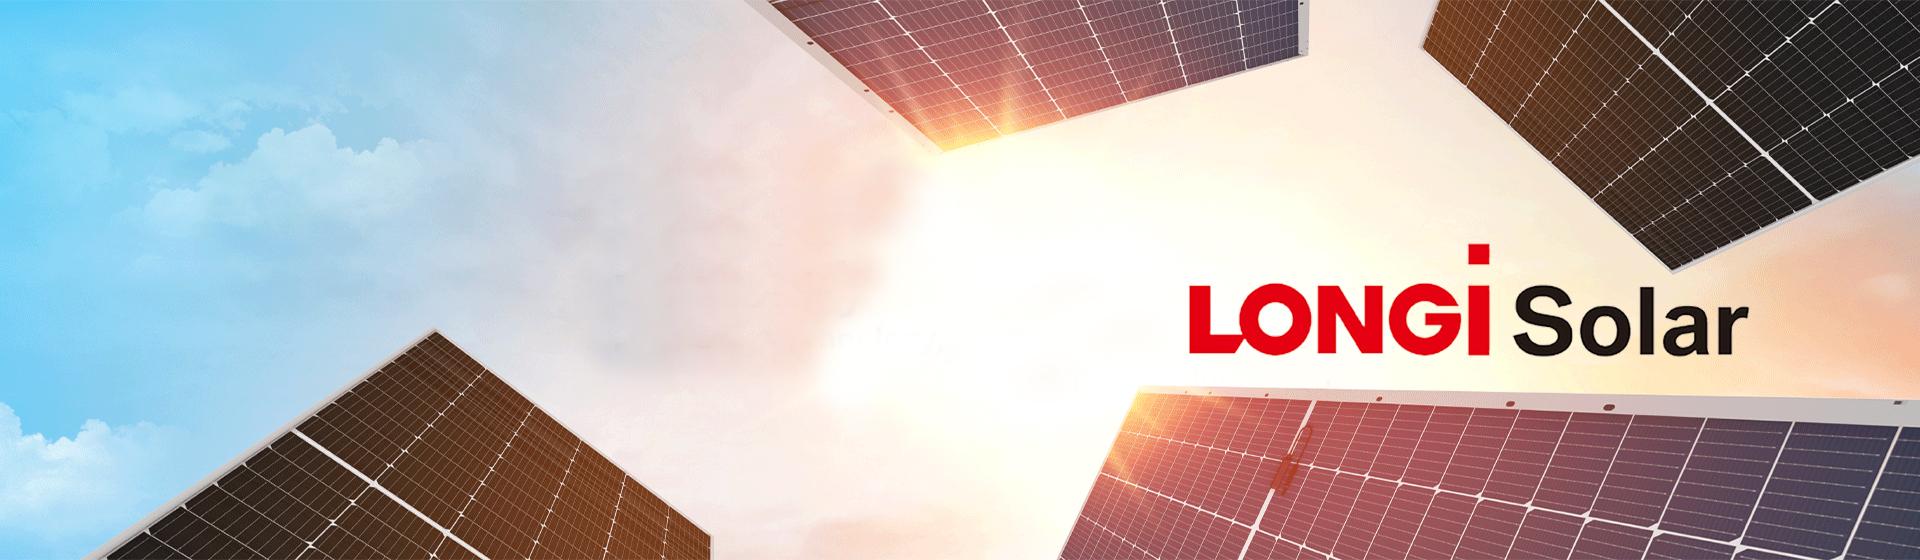 Longi Solar napelemek